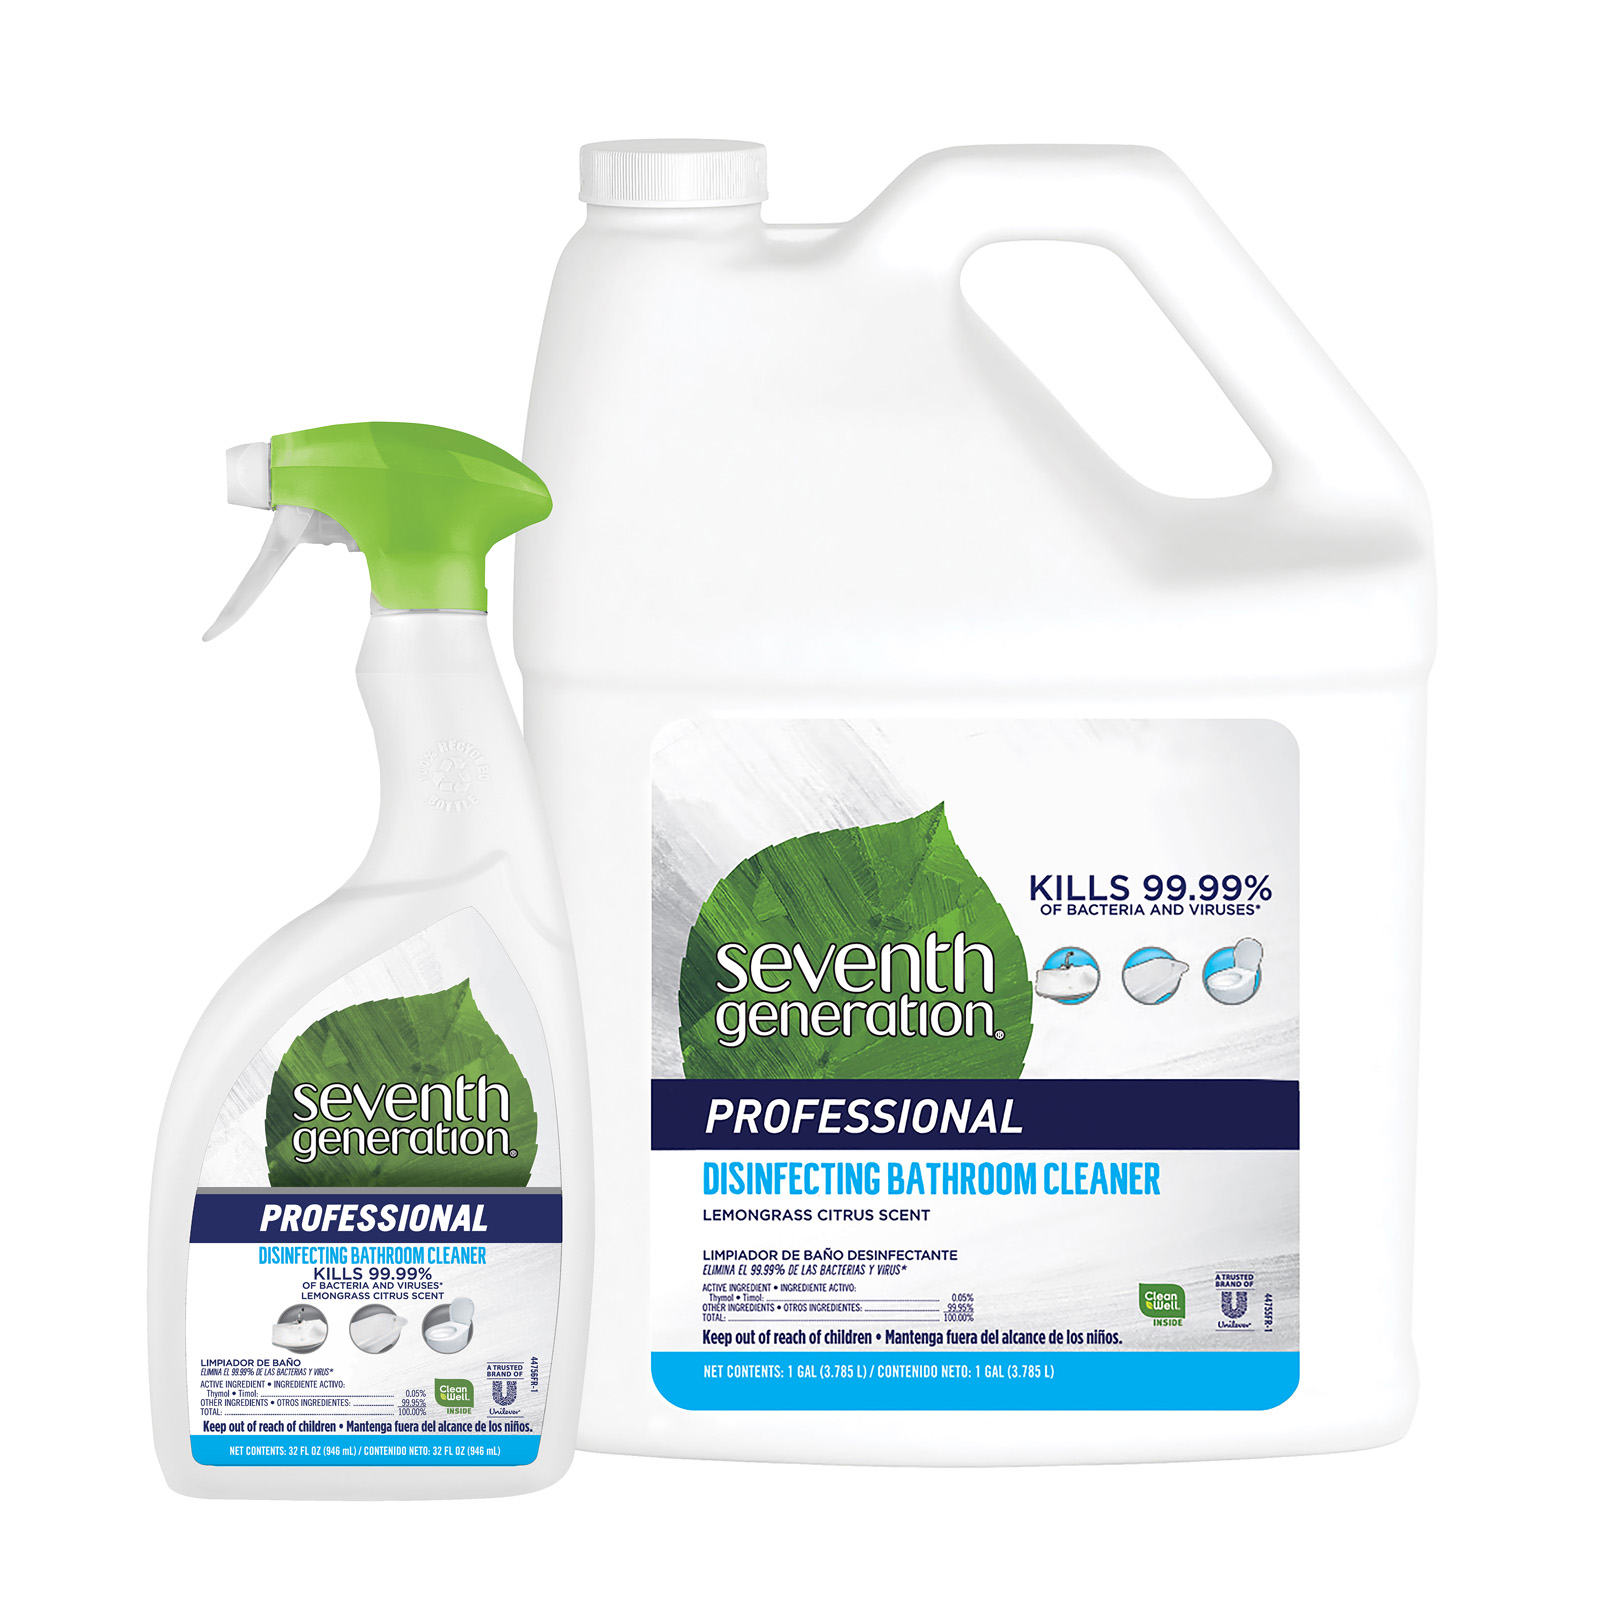 Disinfecting Bathroom Cleaner